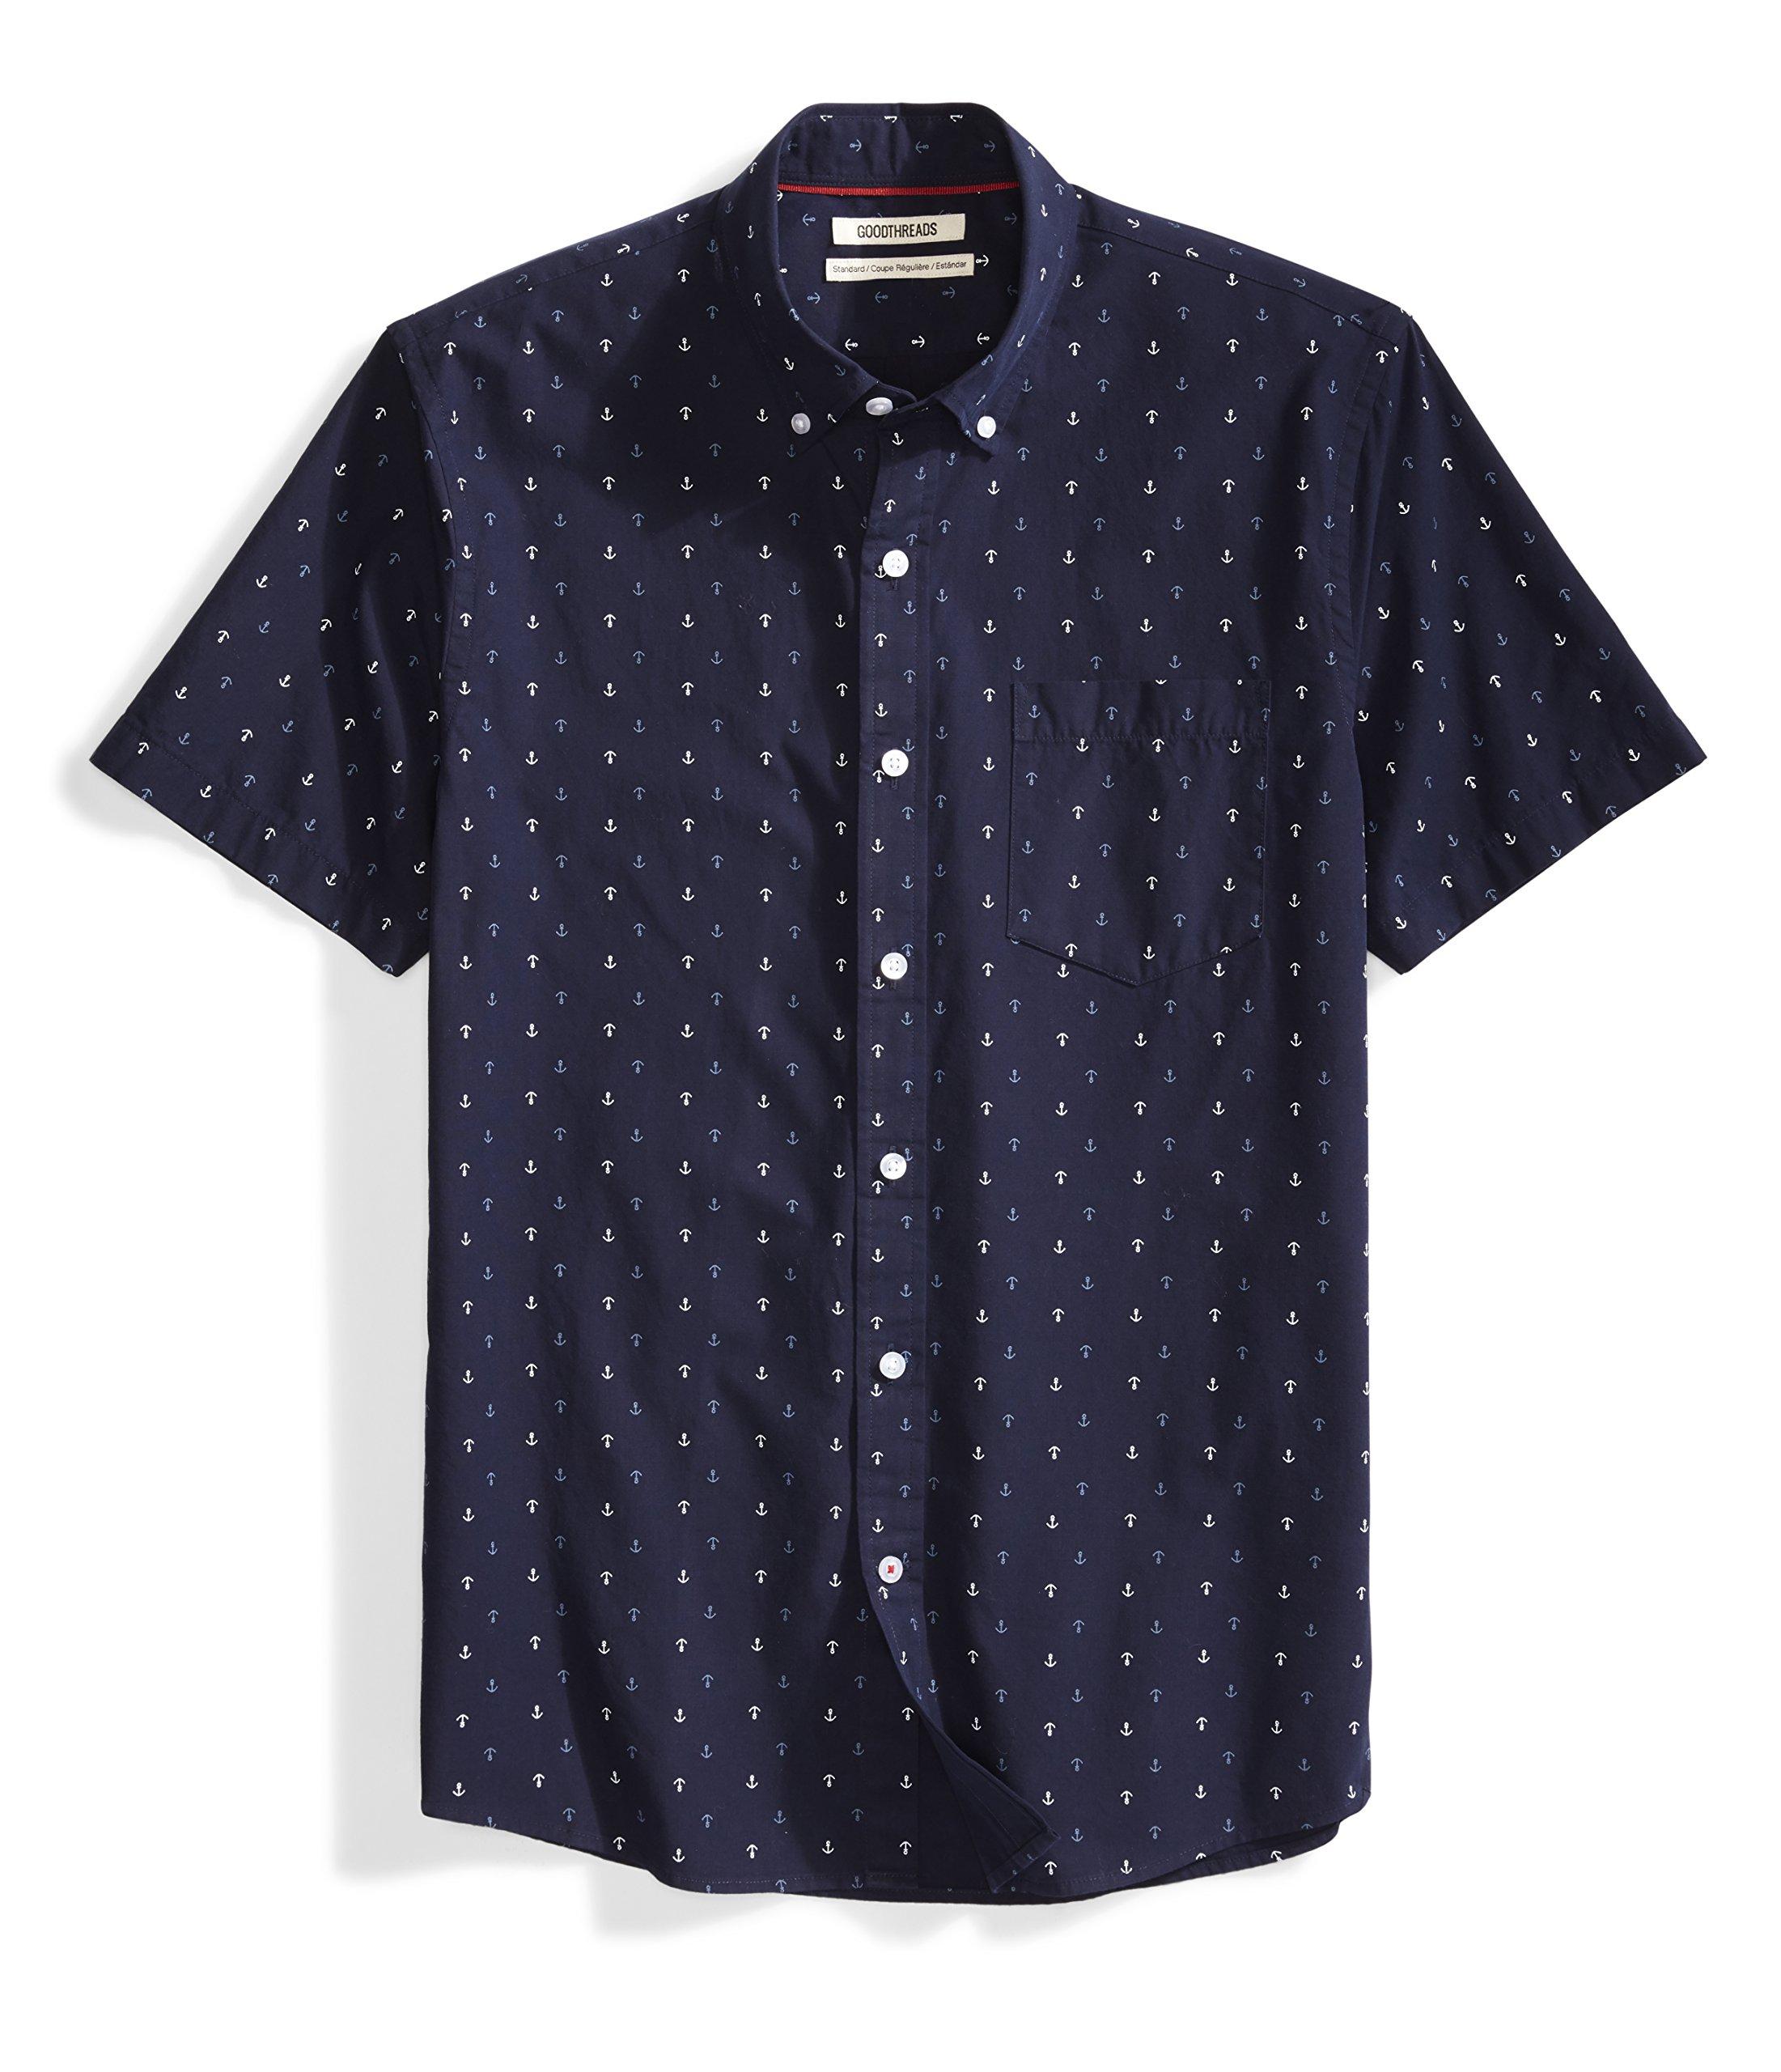 Goodthreads Men's Standard-Fit Short-Sleeve Printed Shirt, -navy ground anchor Printed, Large